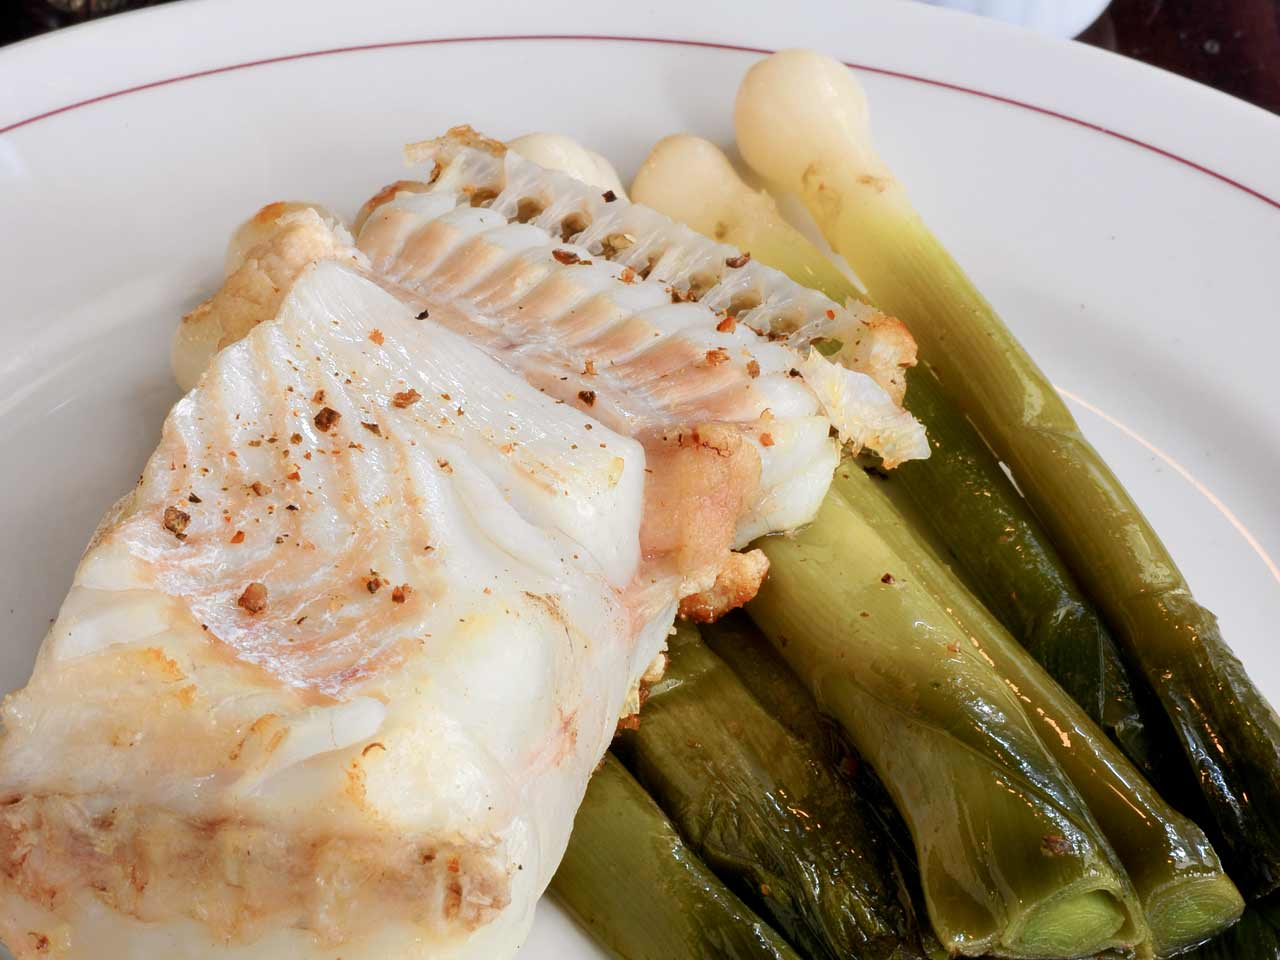 Pollock fillet with saut ed chanterelles saga for Pollock fish recipe